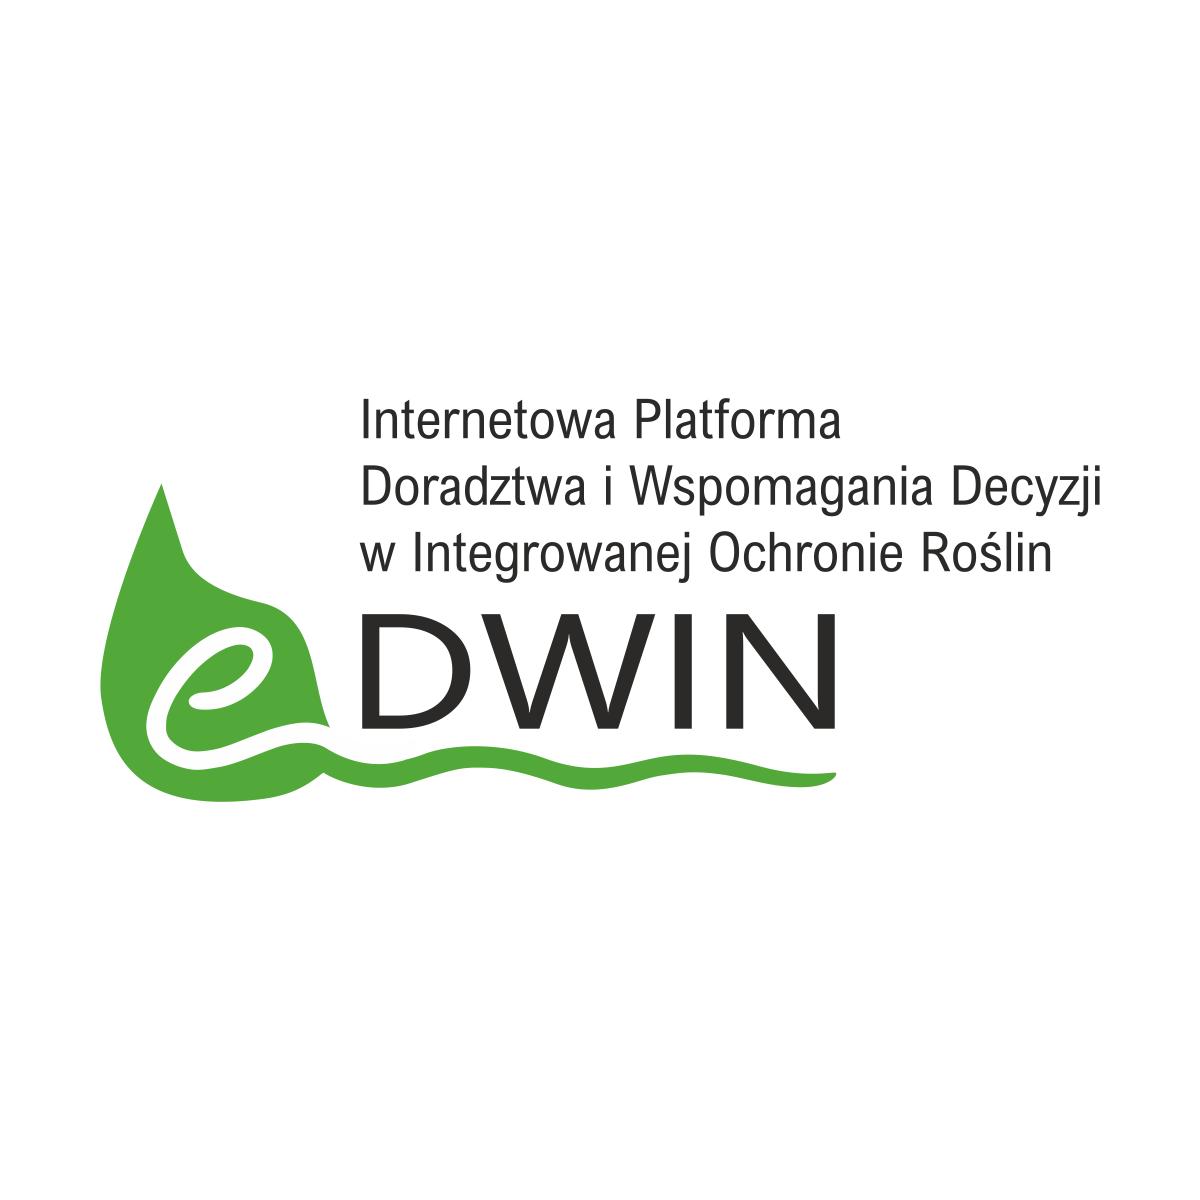 logotyp programu edwin